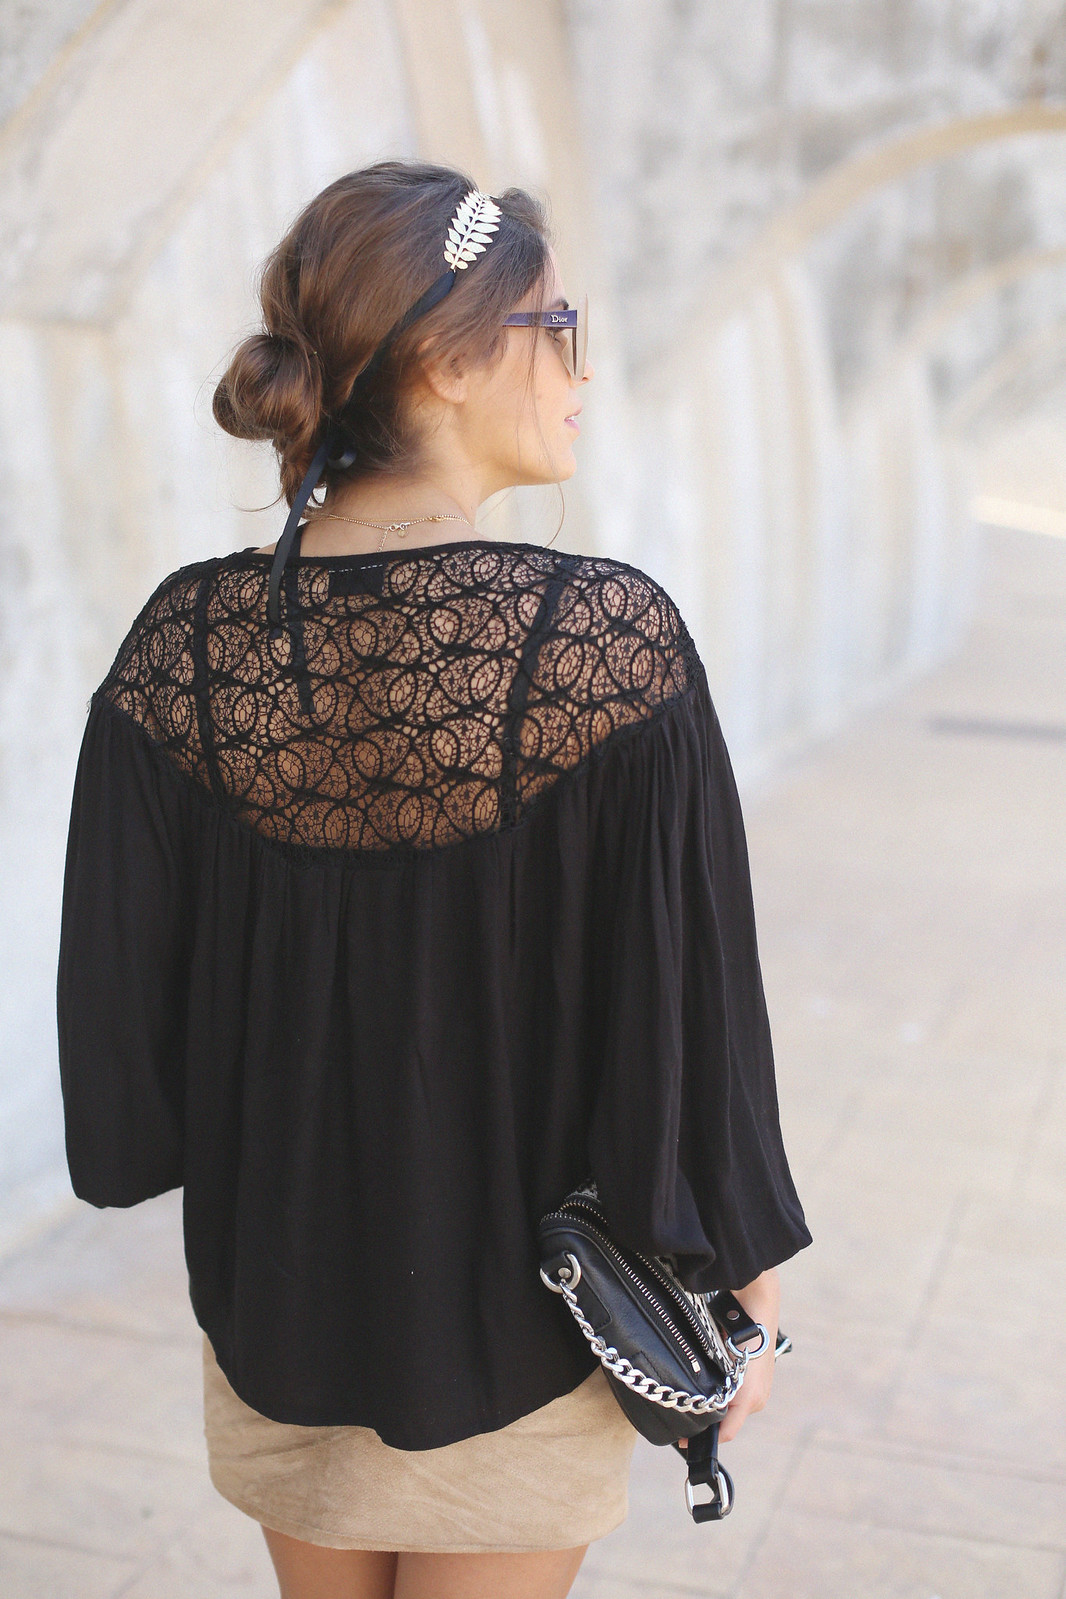 7.black boho top camel suede skirt gladiator sandals golden headband seams for a desire jessie chanes